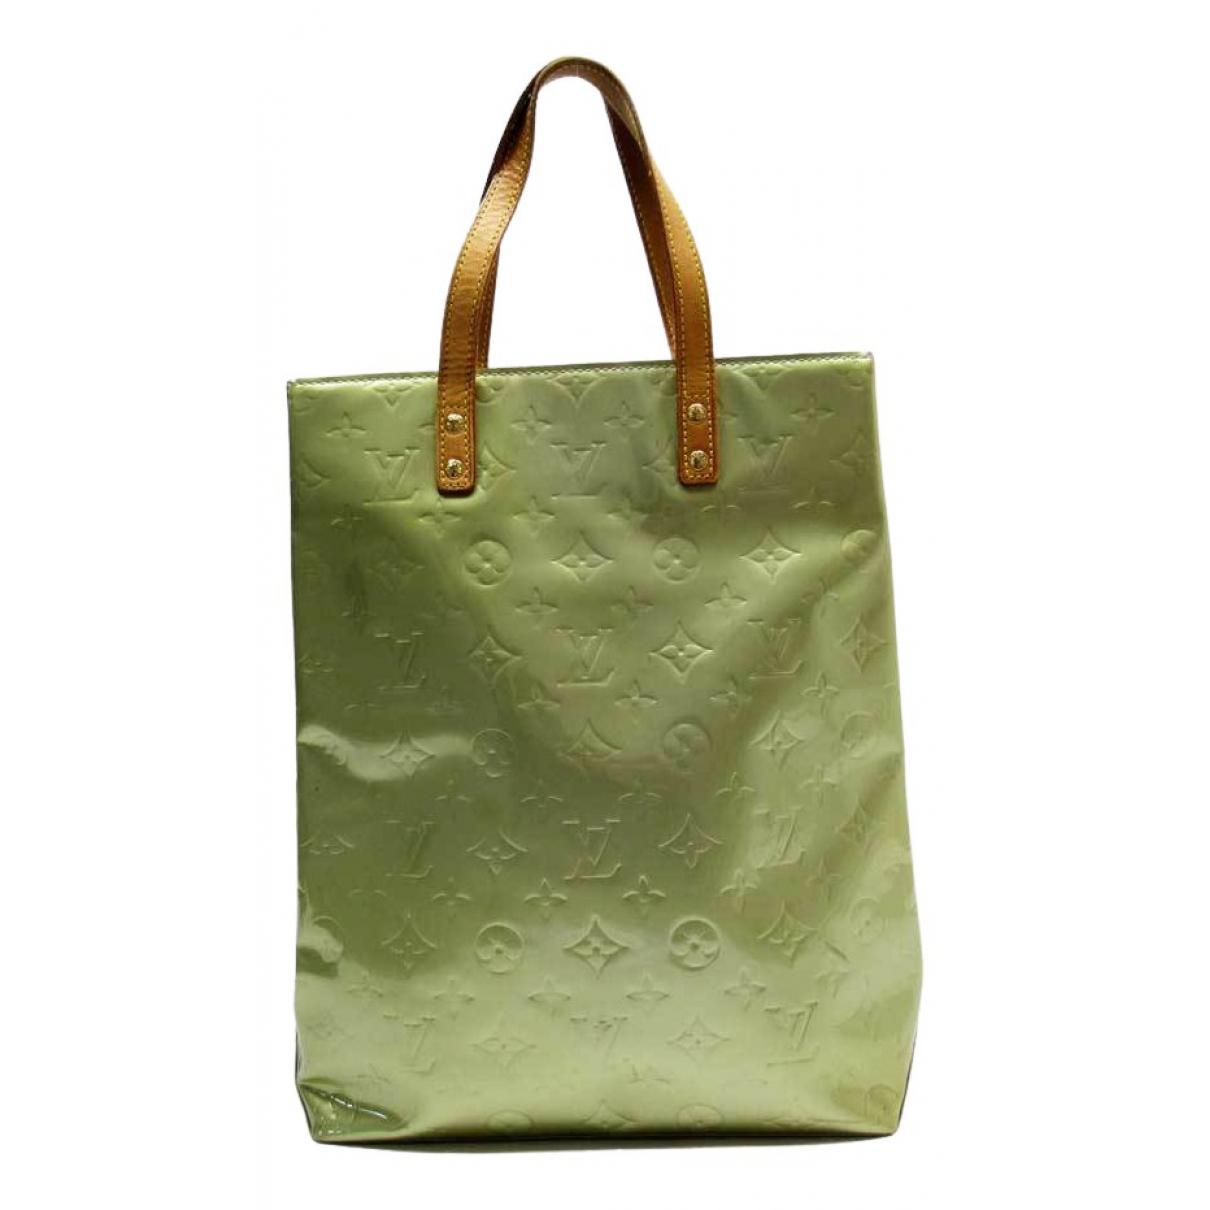 Louis Vuitton Reade Grey Patent leather handbag for Women \N